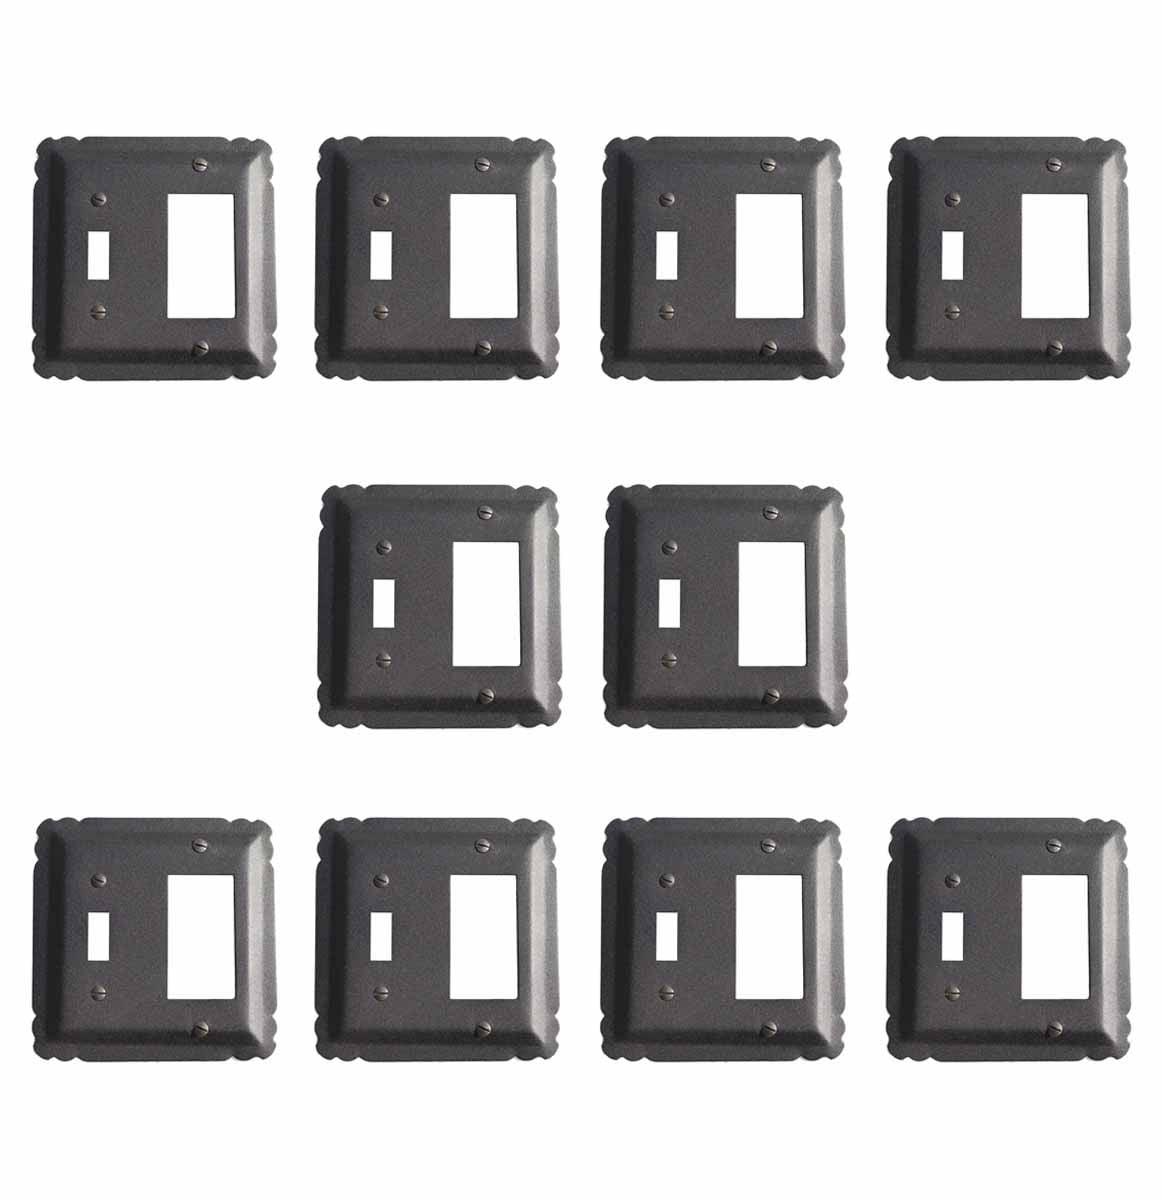 "10 Switchplate Black Wrought Iron GFI/Toggle 5 1/4"" | Renovator's Supply"